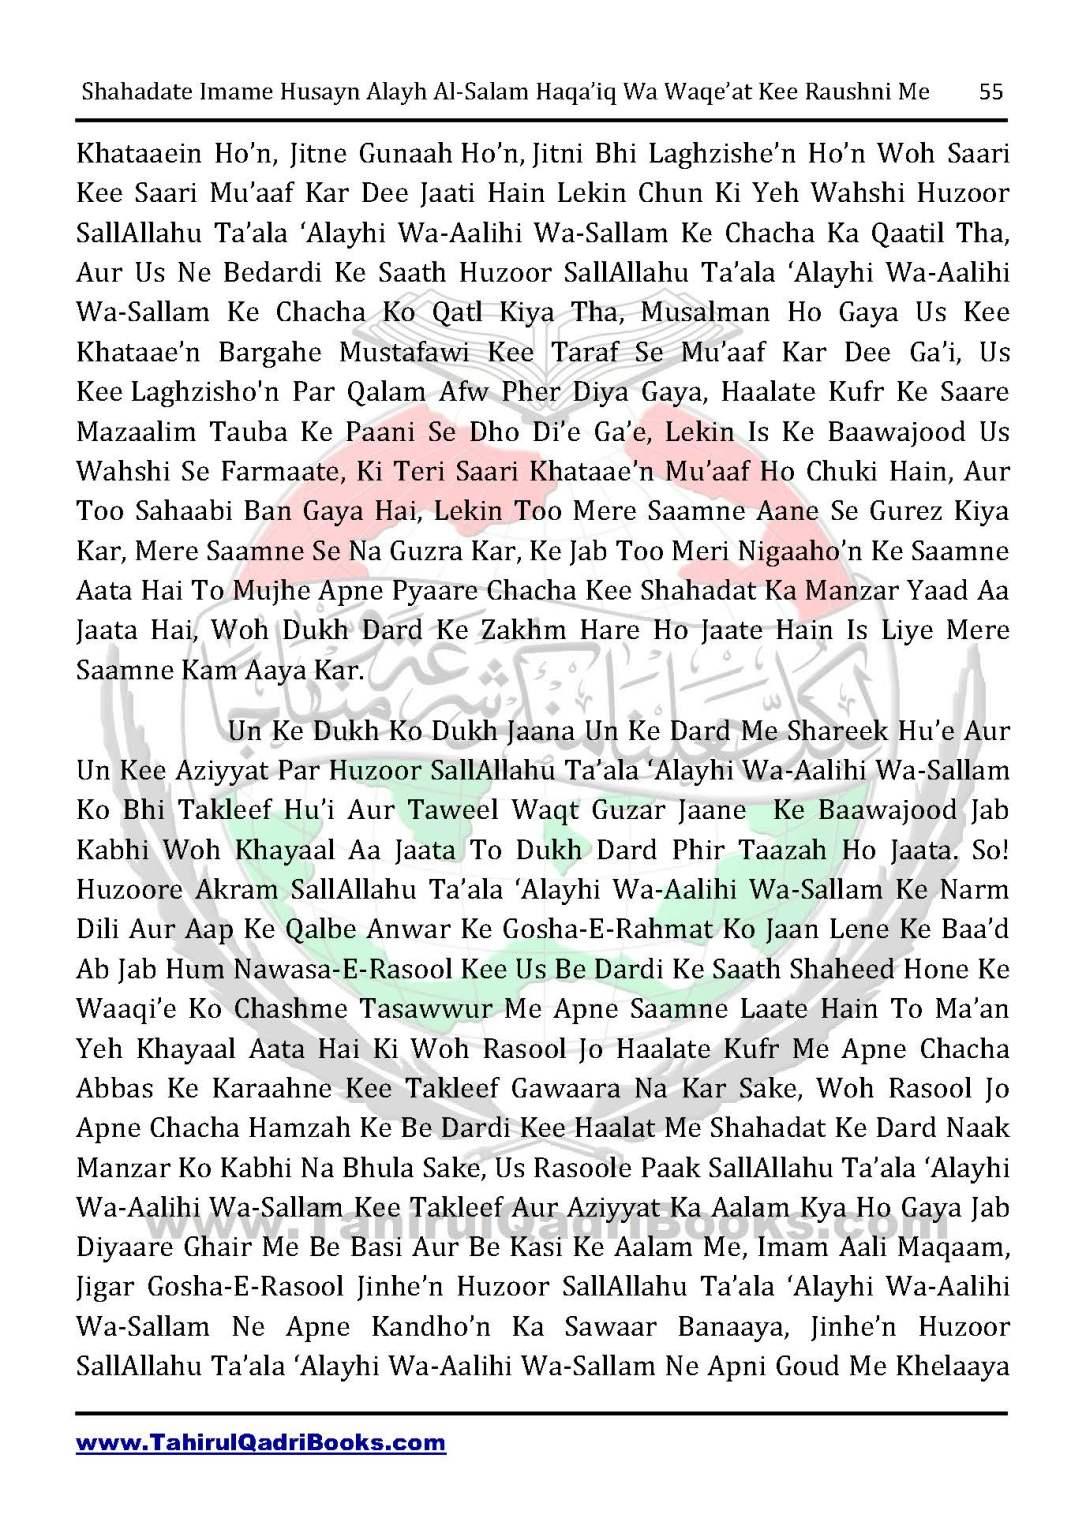 shahadate-imame-husayn-alayh-is-salam-haqaiq-wa-waqe_at-kee-raushni-me-in-roman-urdu-unlocked_Page_55